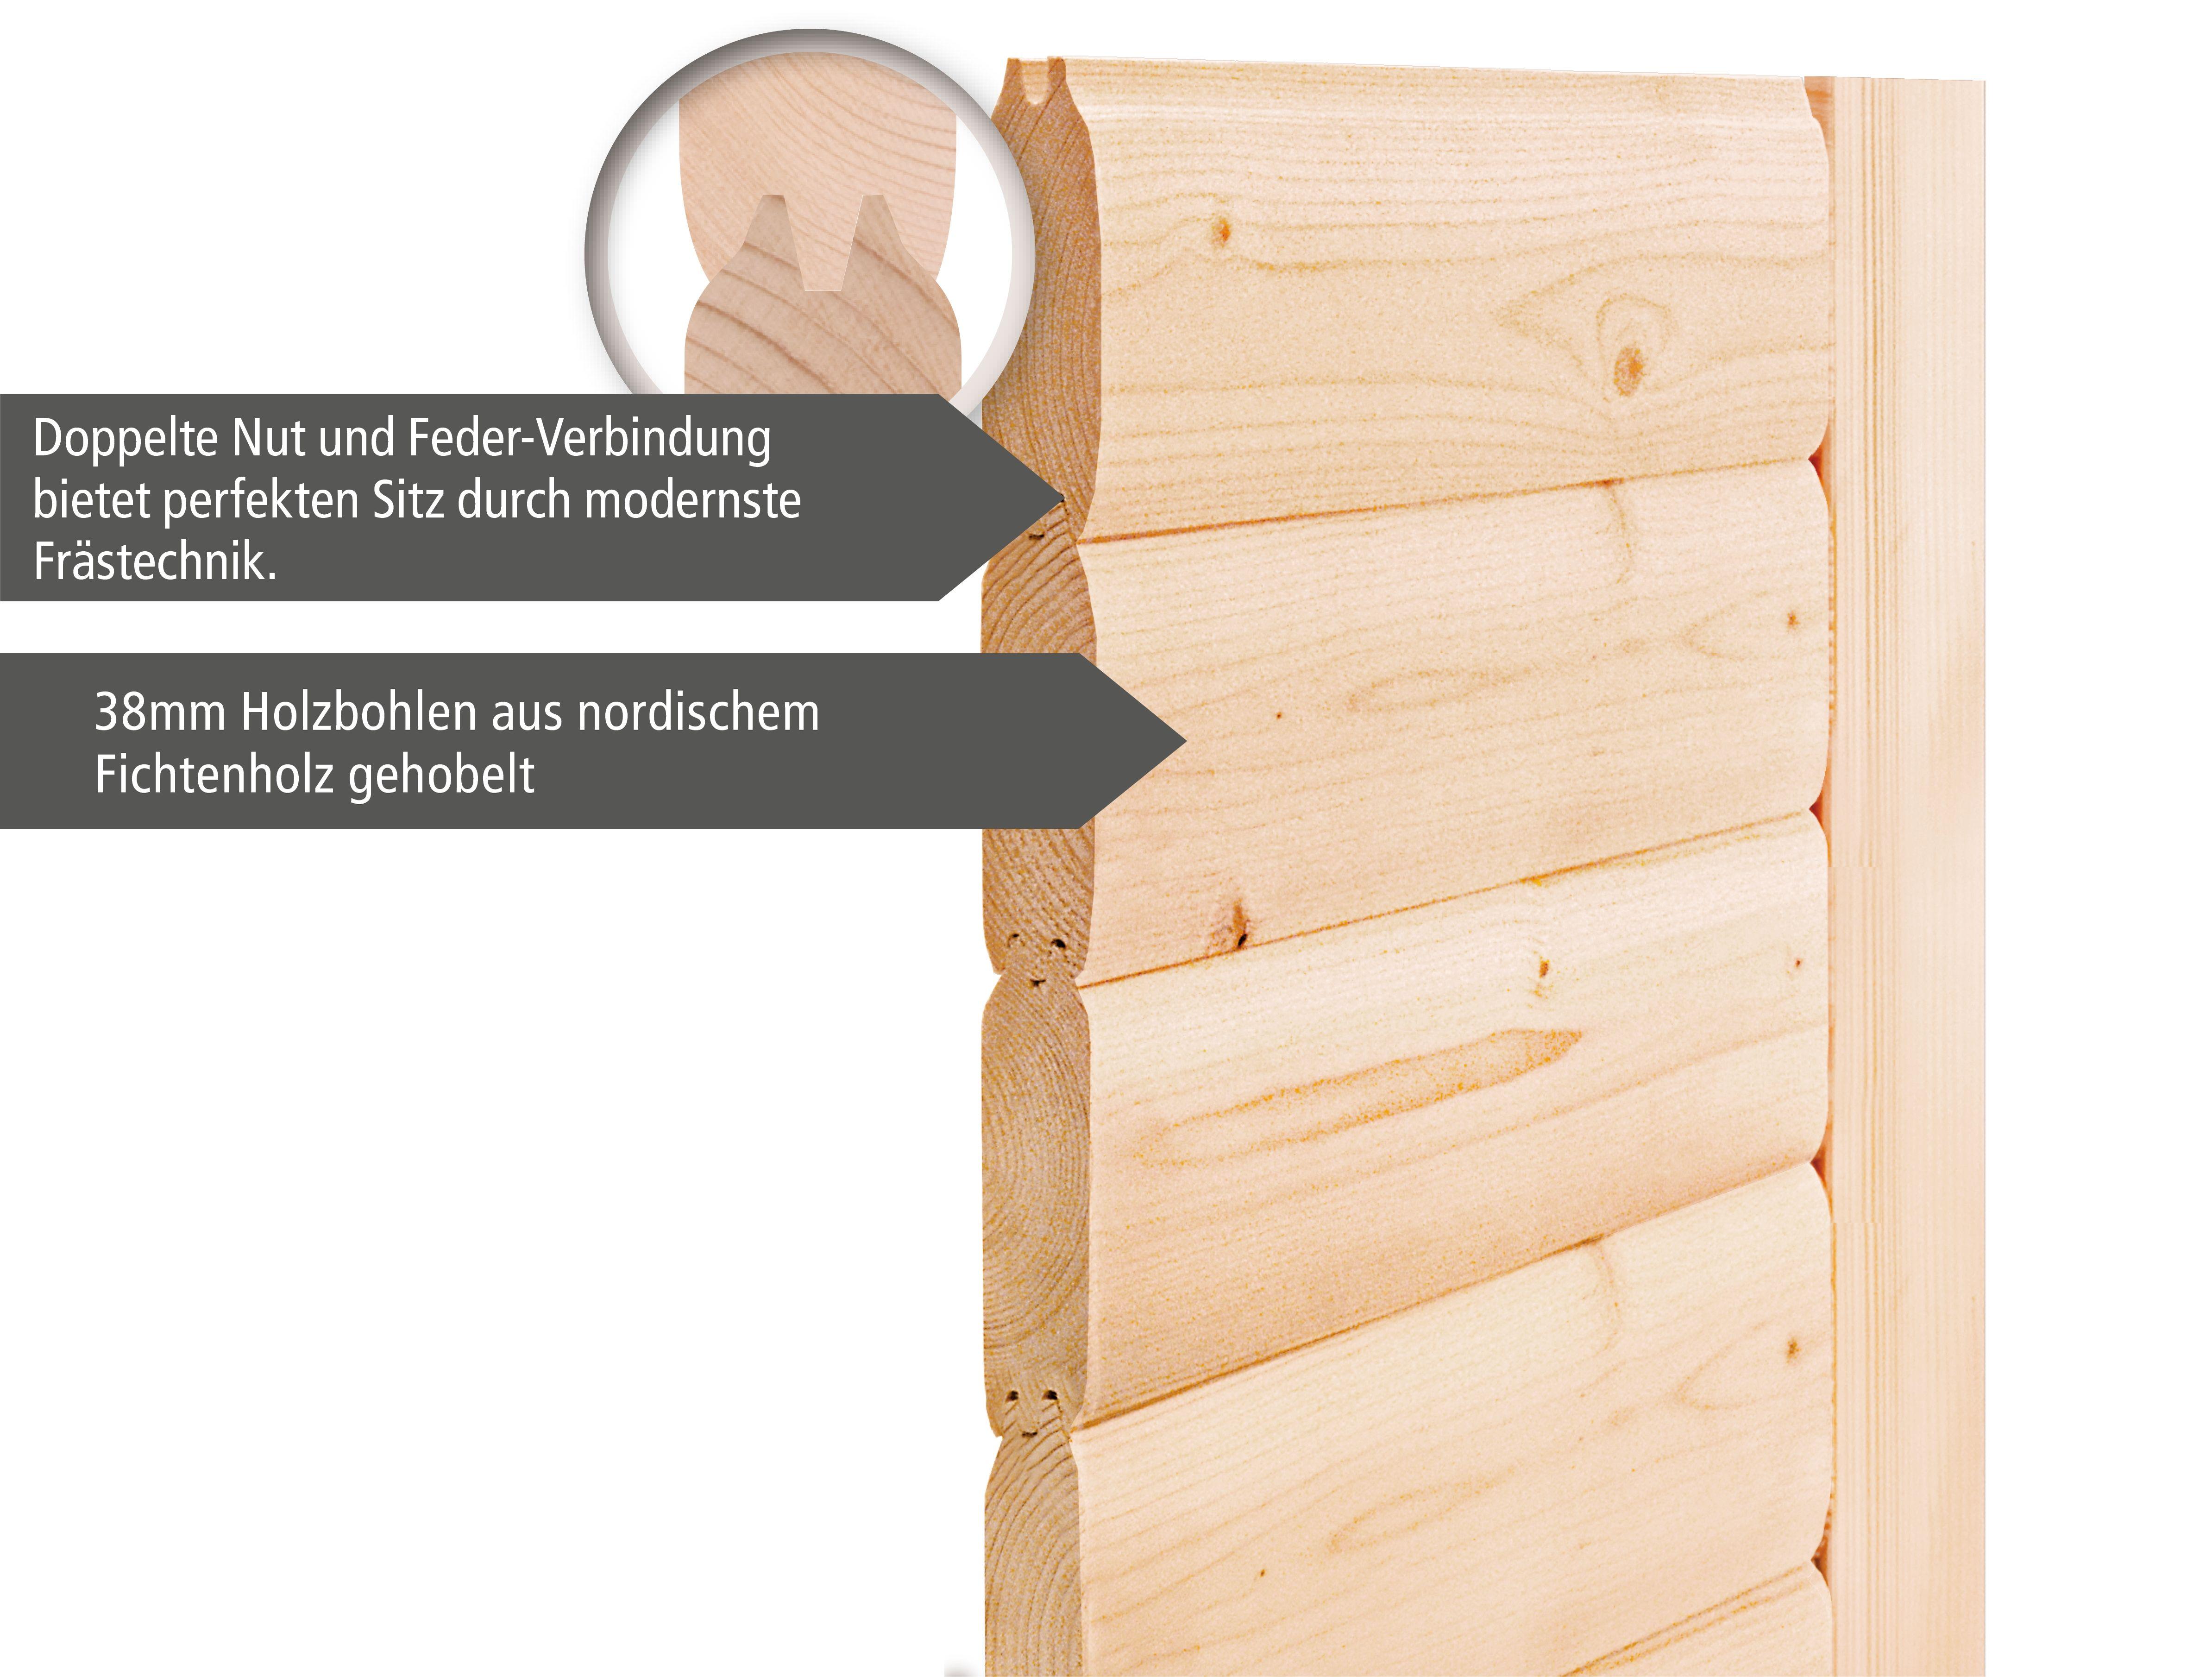 Woodfeeling Sauna Jella 38mm Dachkranz 230V Bio Saunaofen 3,6 kW exter Bild 6